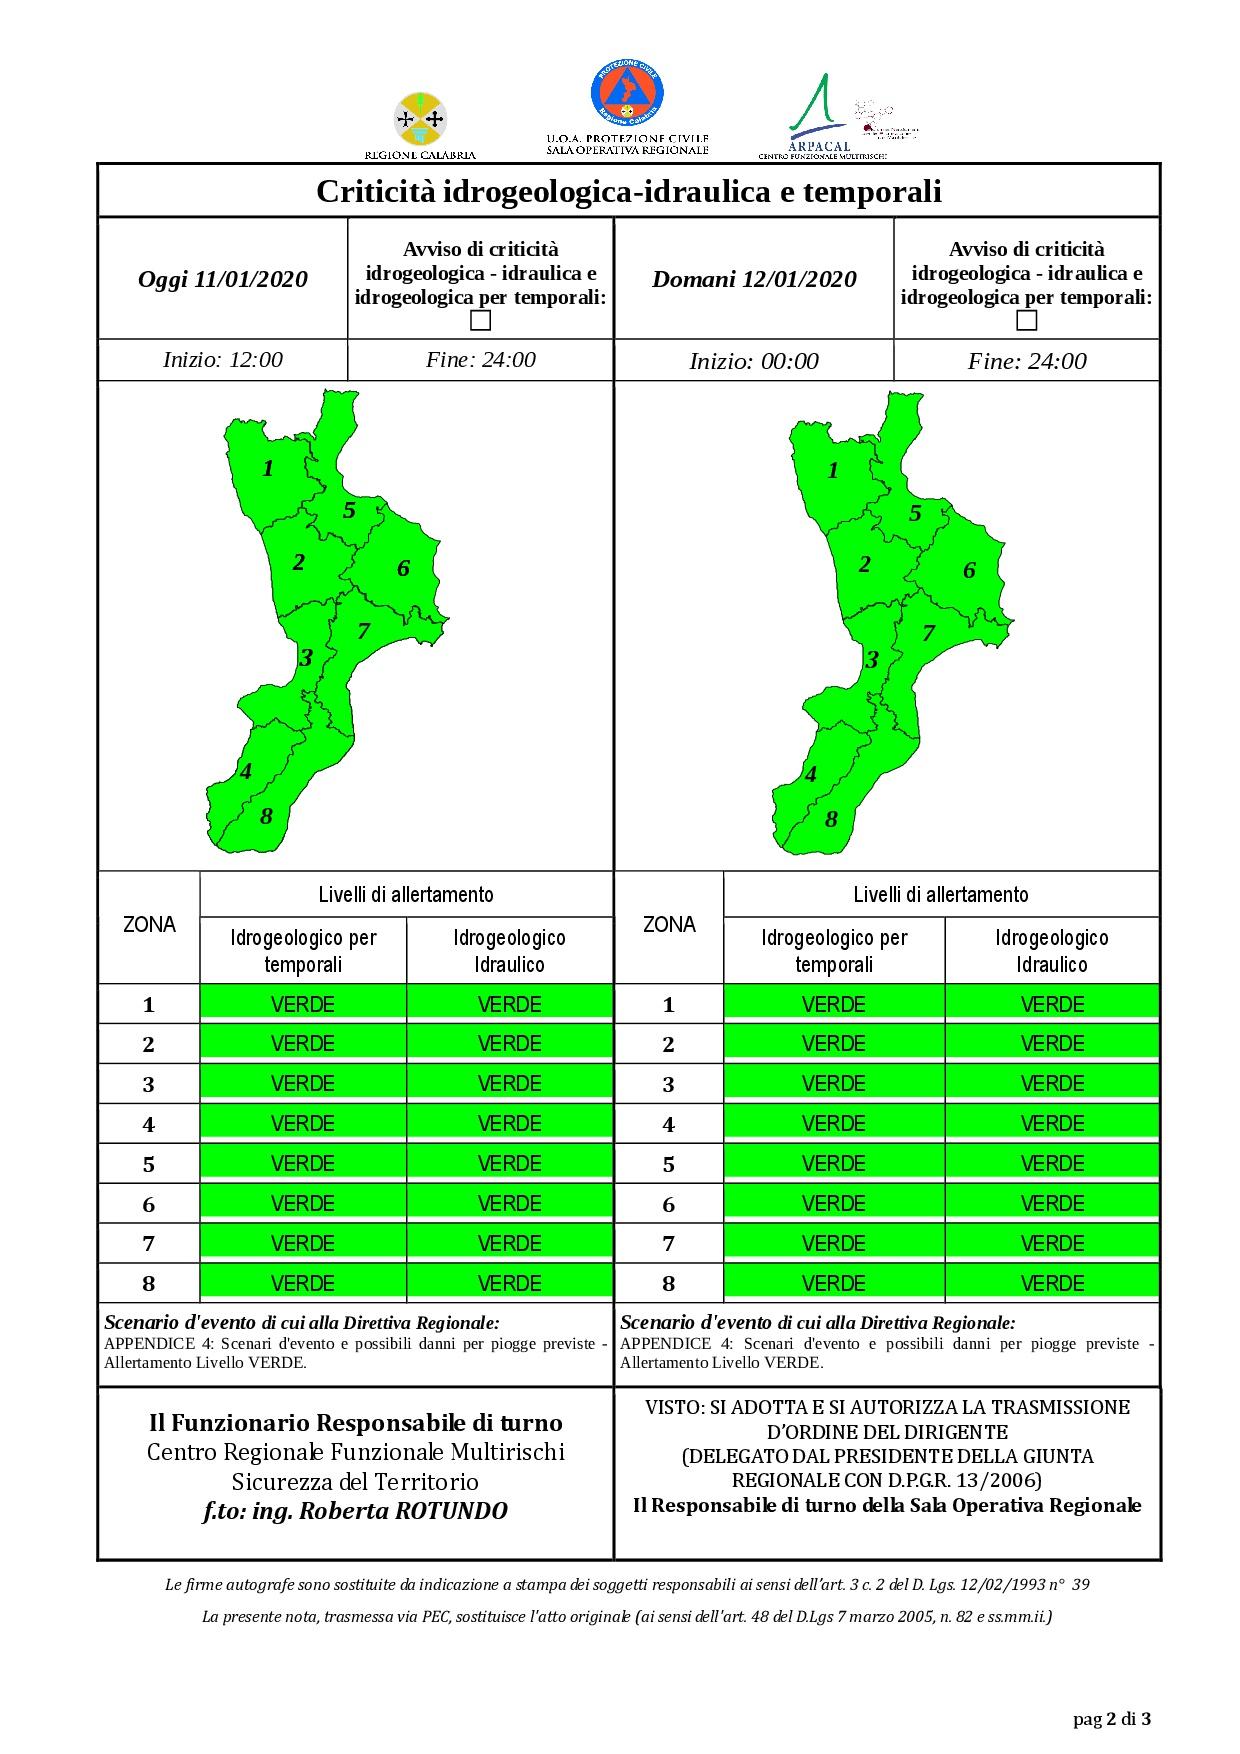 Criticità idrogeologica-idraulica e temporali in Calabria 11-01-2020